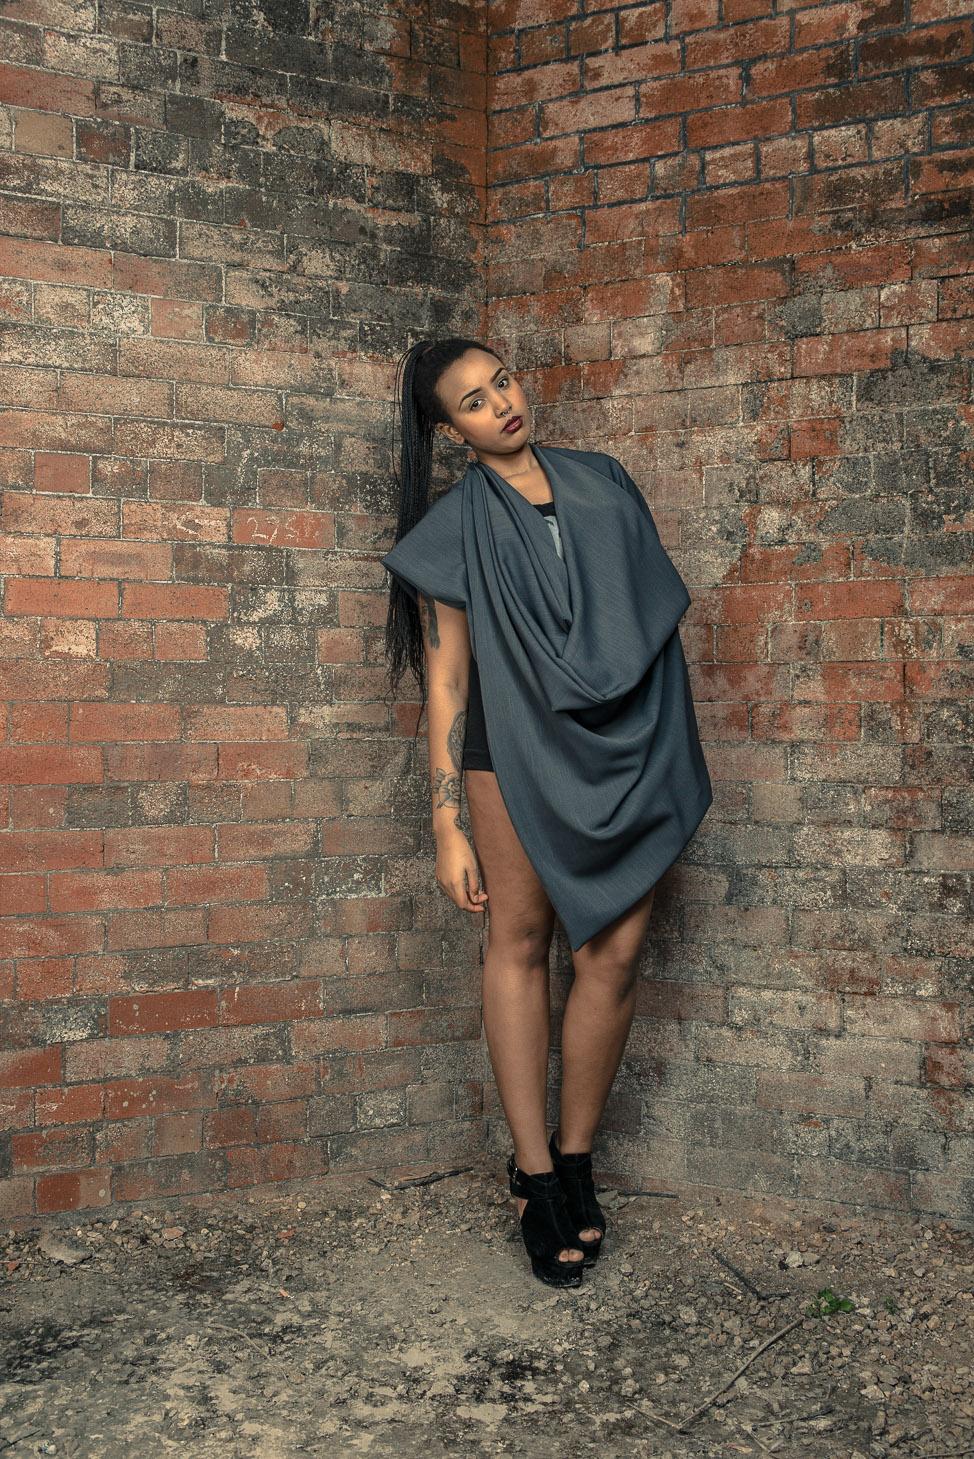 zaramia-ava-zaramiaava-leeds-fashion-designer-ethical-sustainable-tailored-minimalist-cape-versatile-drape-grey-bodysuit-black-belt-wrap-cowl-styling-womenswear-models-photoshoot-location-20